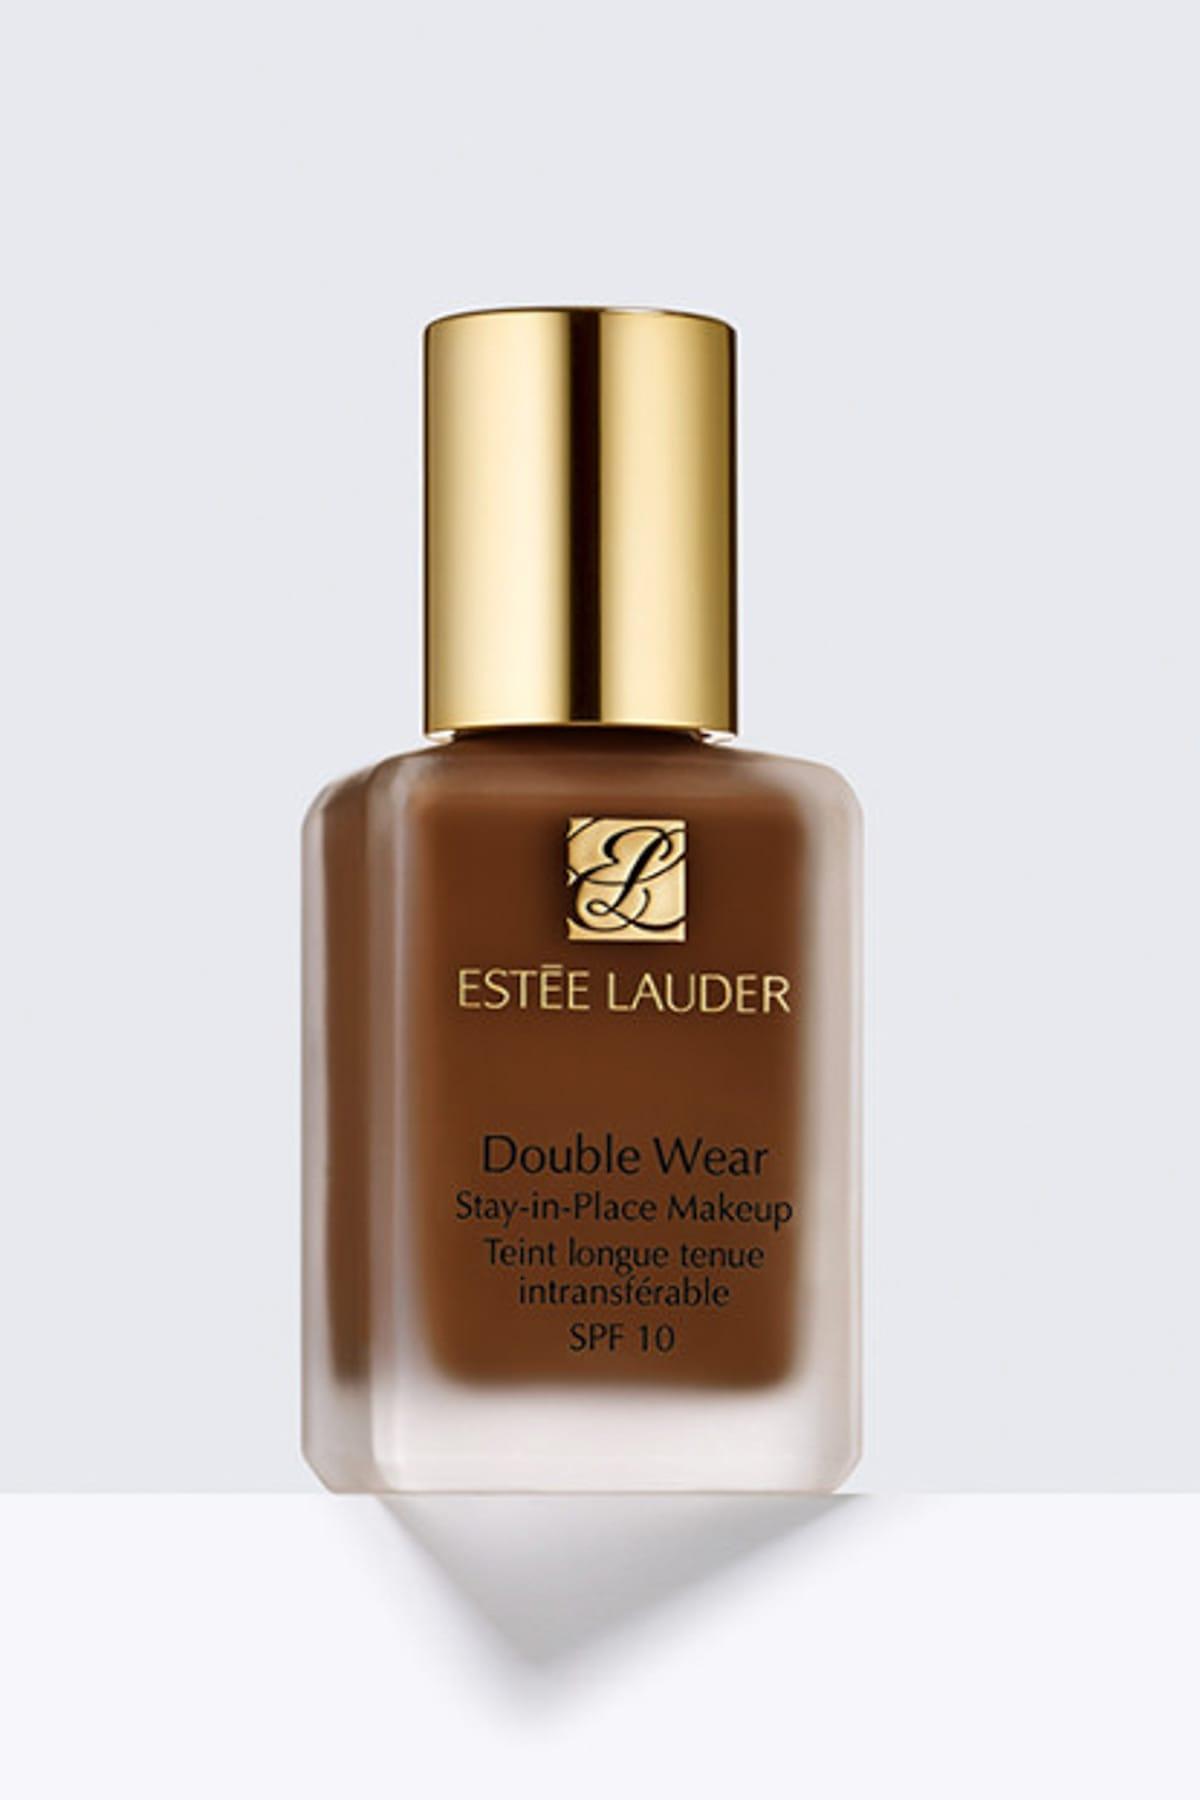 Estee Lauder Fondöten - Double Wear Foundation S.I.P Spf10 7C1 Rich Mahogany 30 ml 887167178656 1